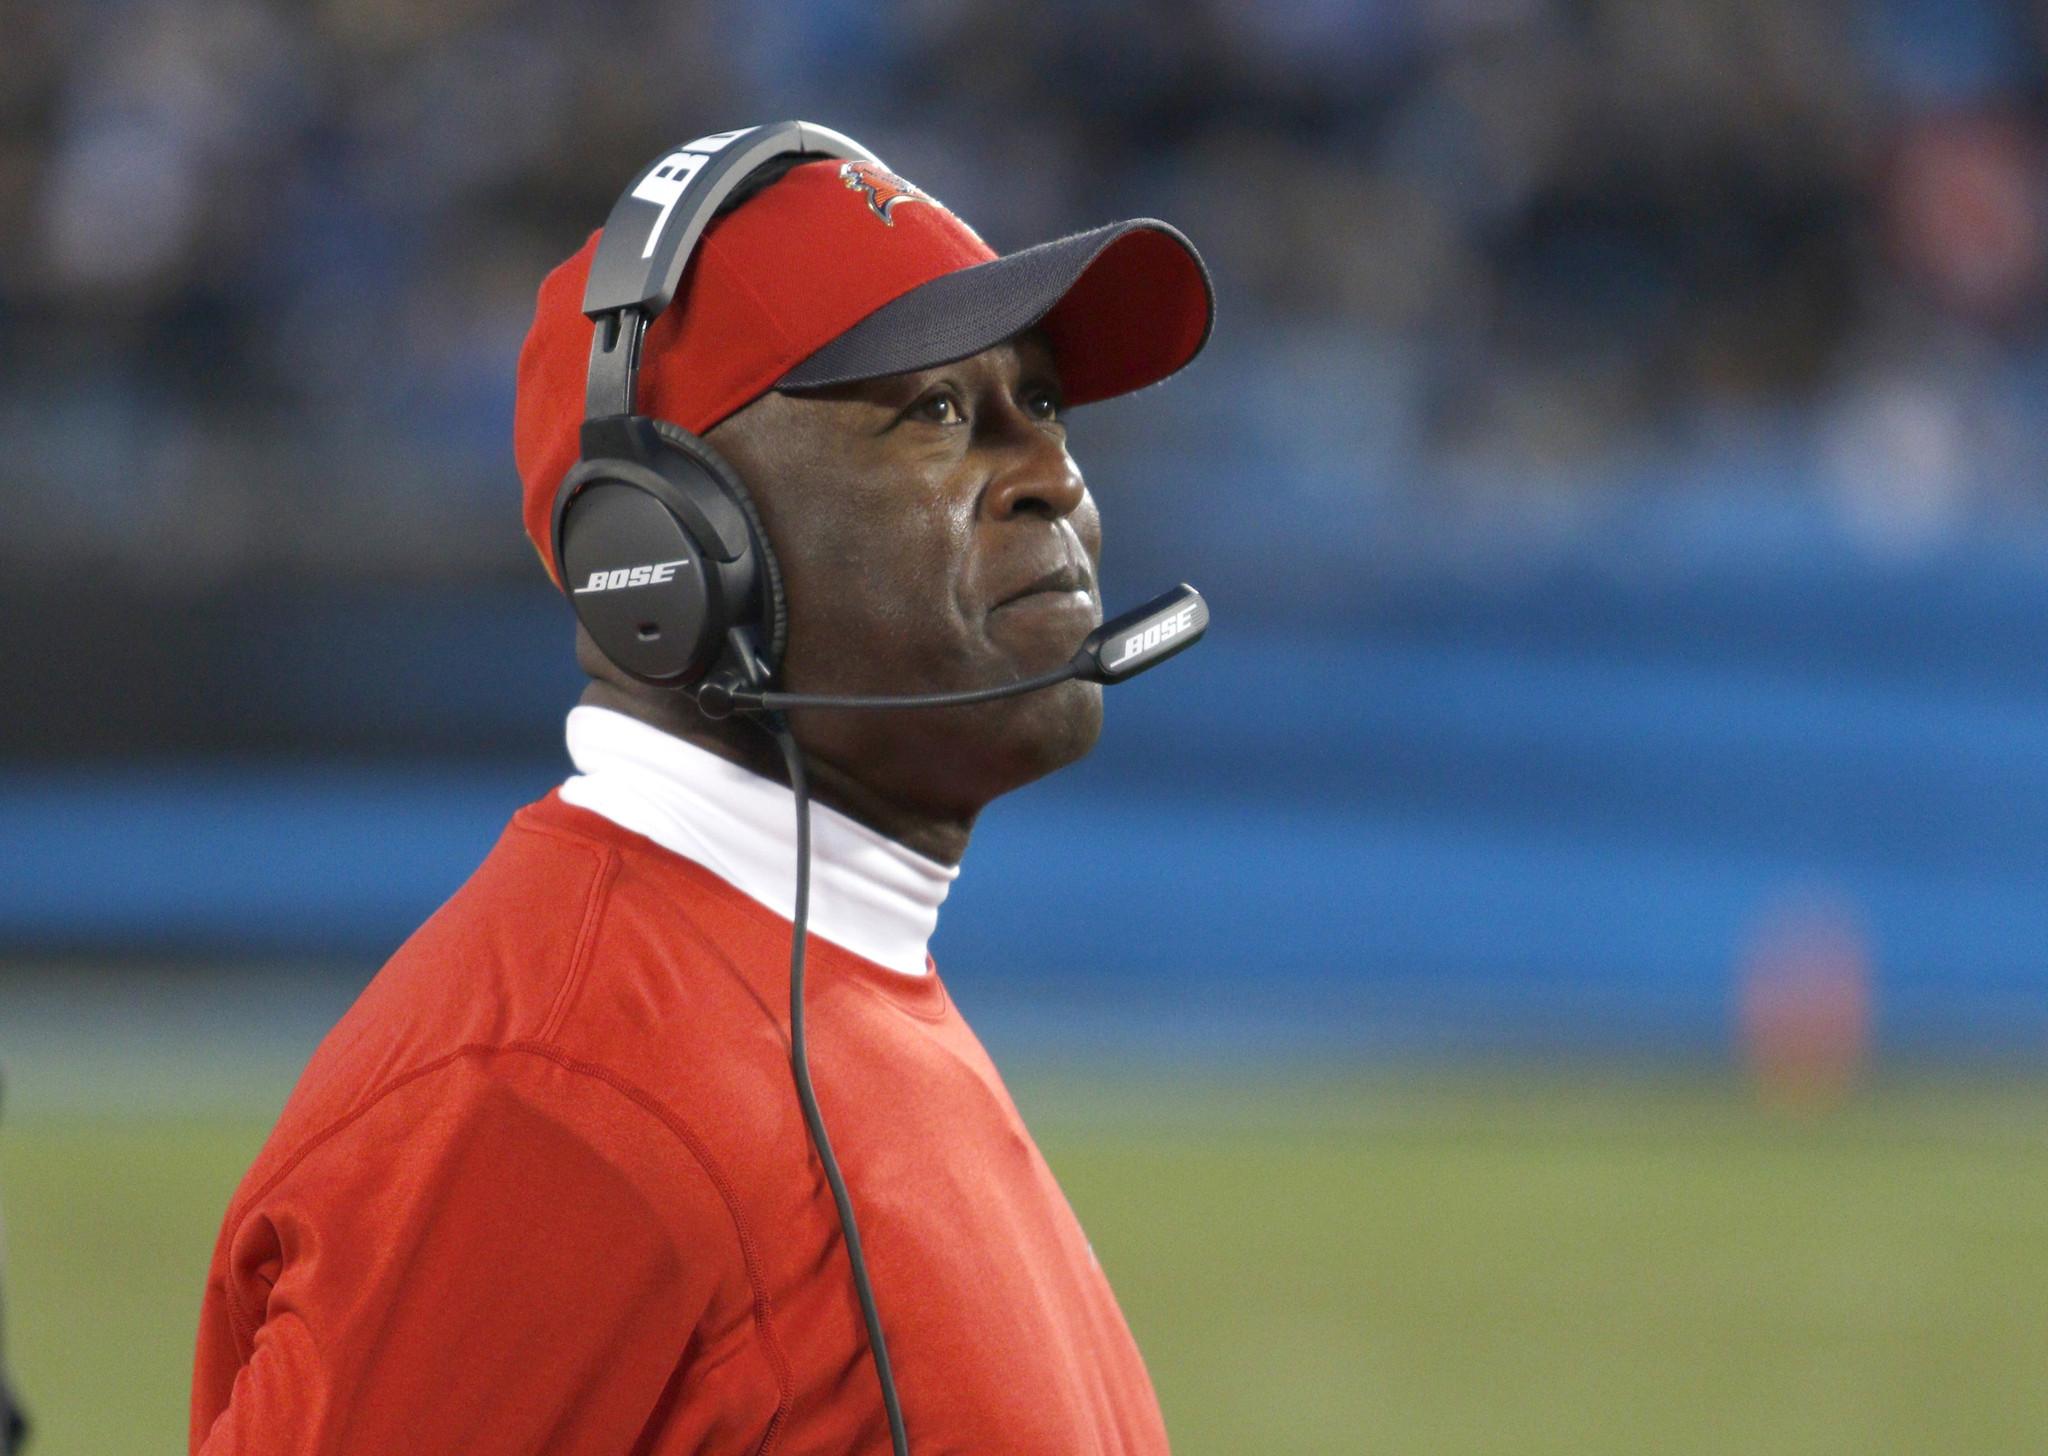 Ohio State cheerleading coach Lenee Buchman fired, interim